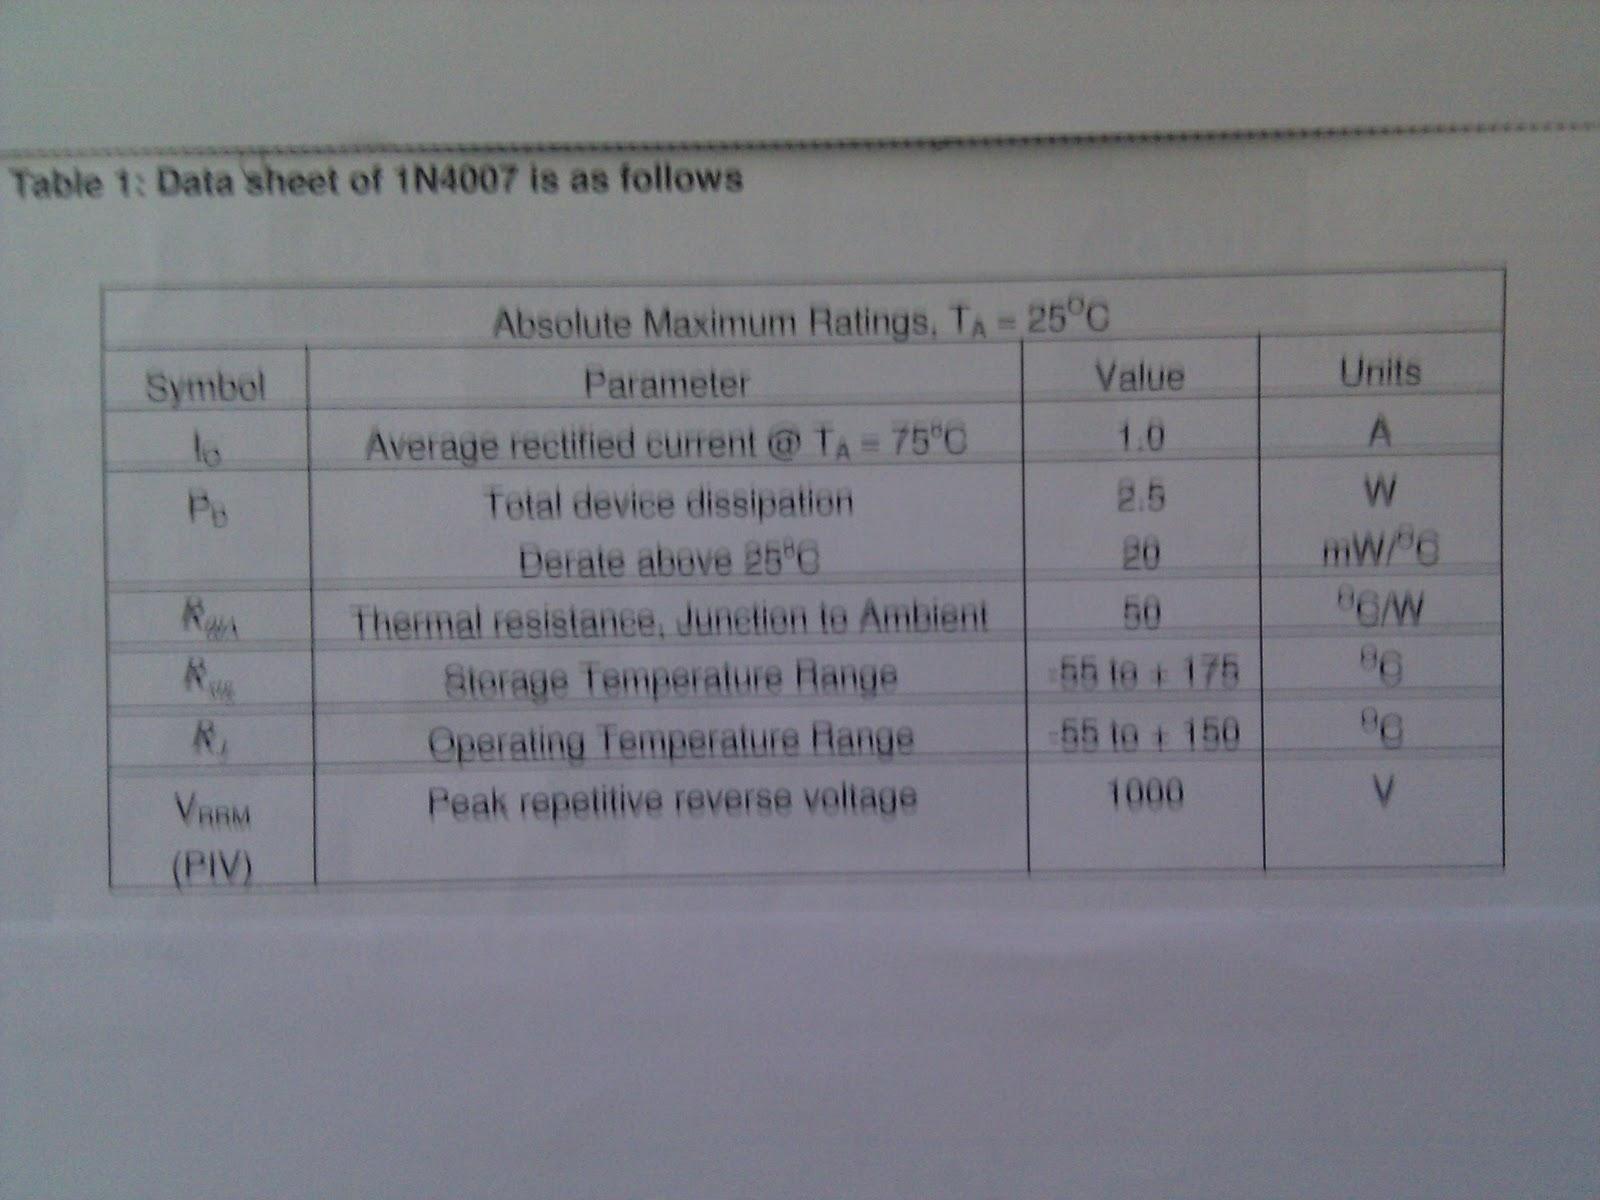 Automotive Electronics 4847 Practical Workbook Blog 1 Mohammed Resistor Symbols Colour Code Tolerance Power Ratings Resistance 1n4007 Data Sheet